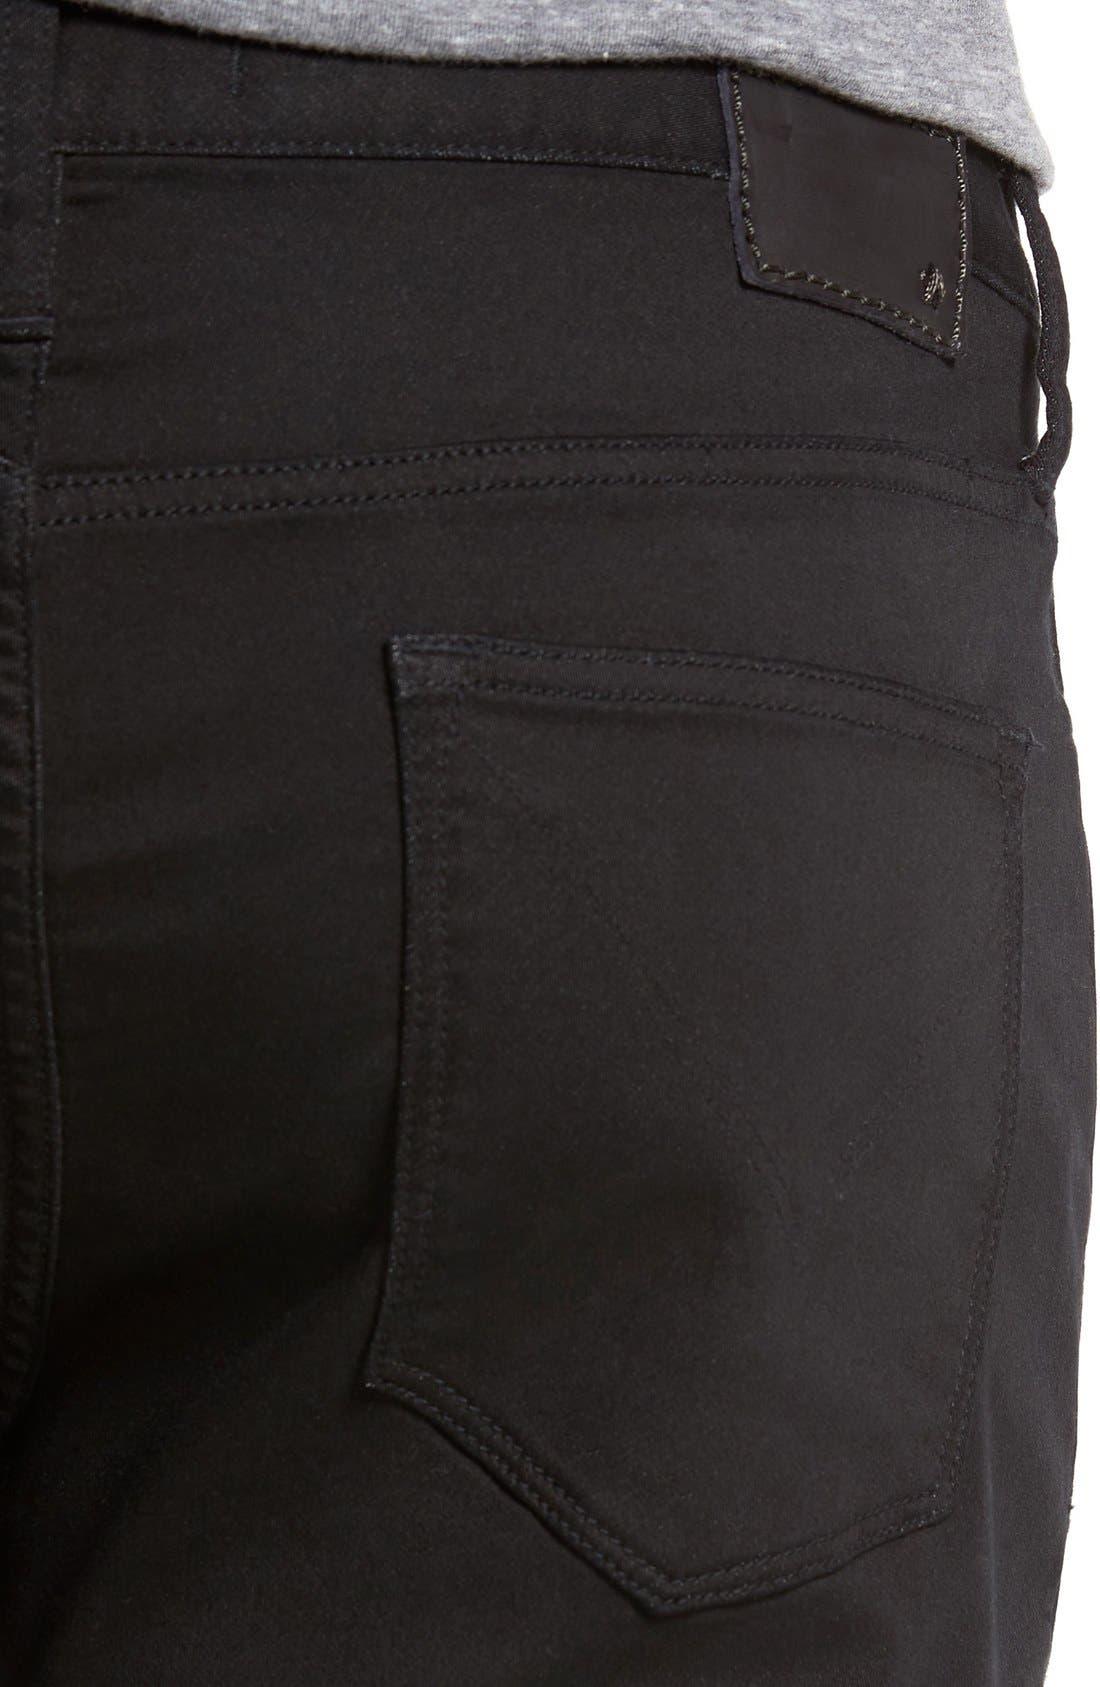 'Bowery' Slim Straight Leg Jeans,                             Alternate thumbnail 2, color,